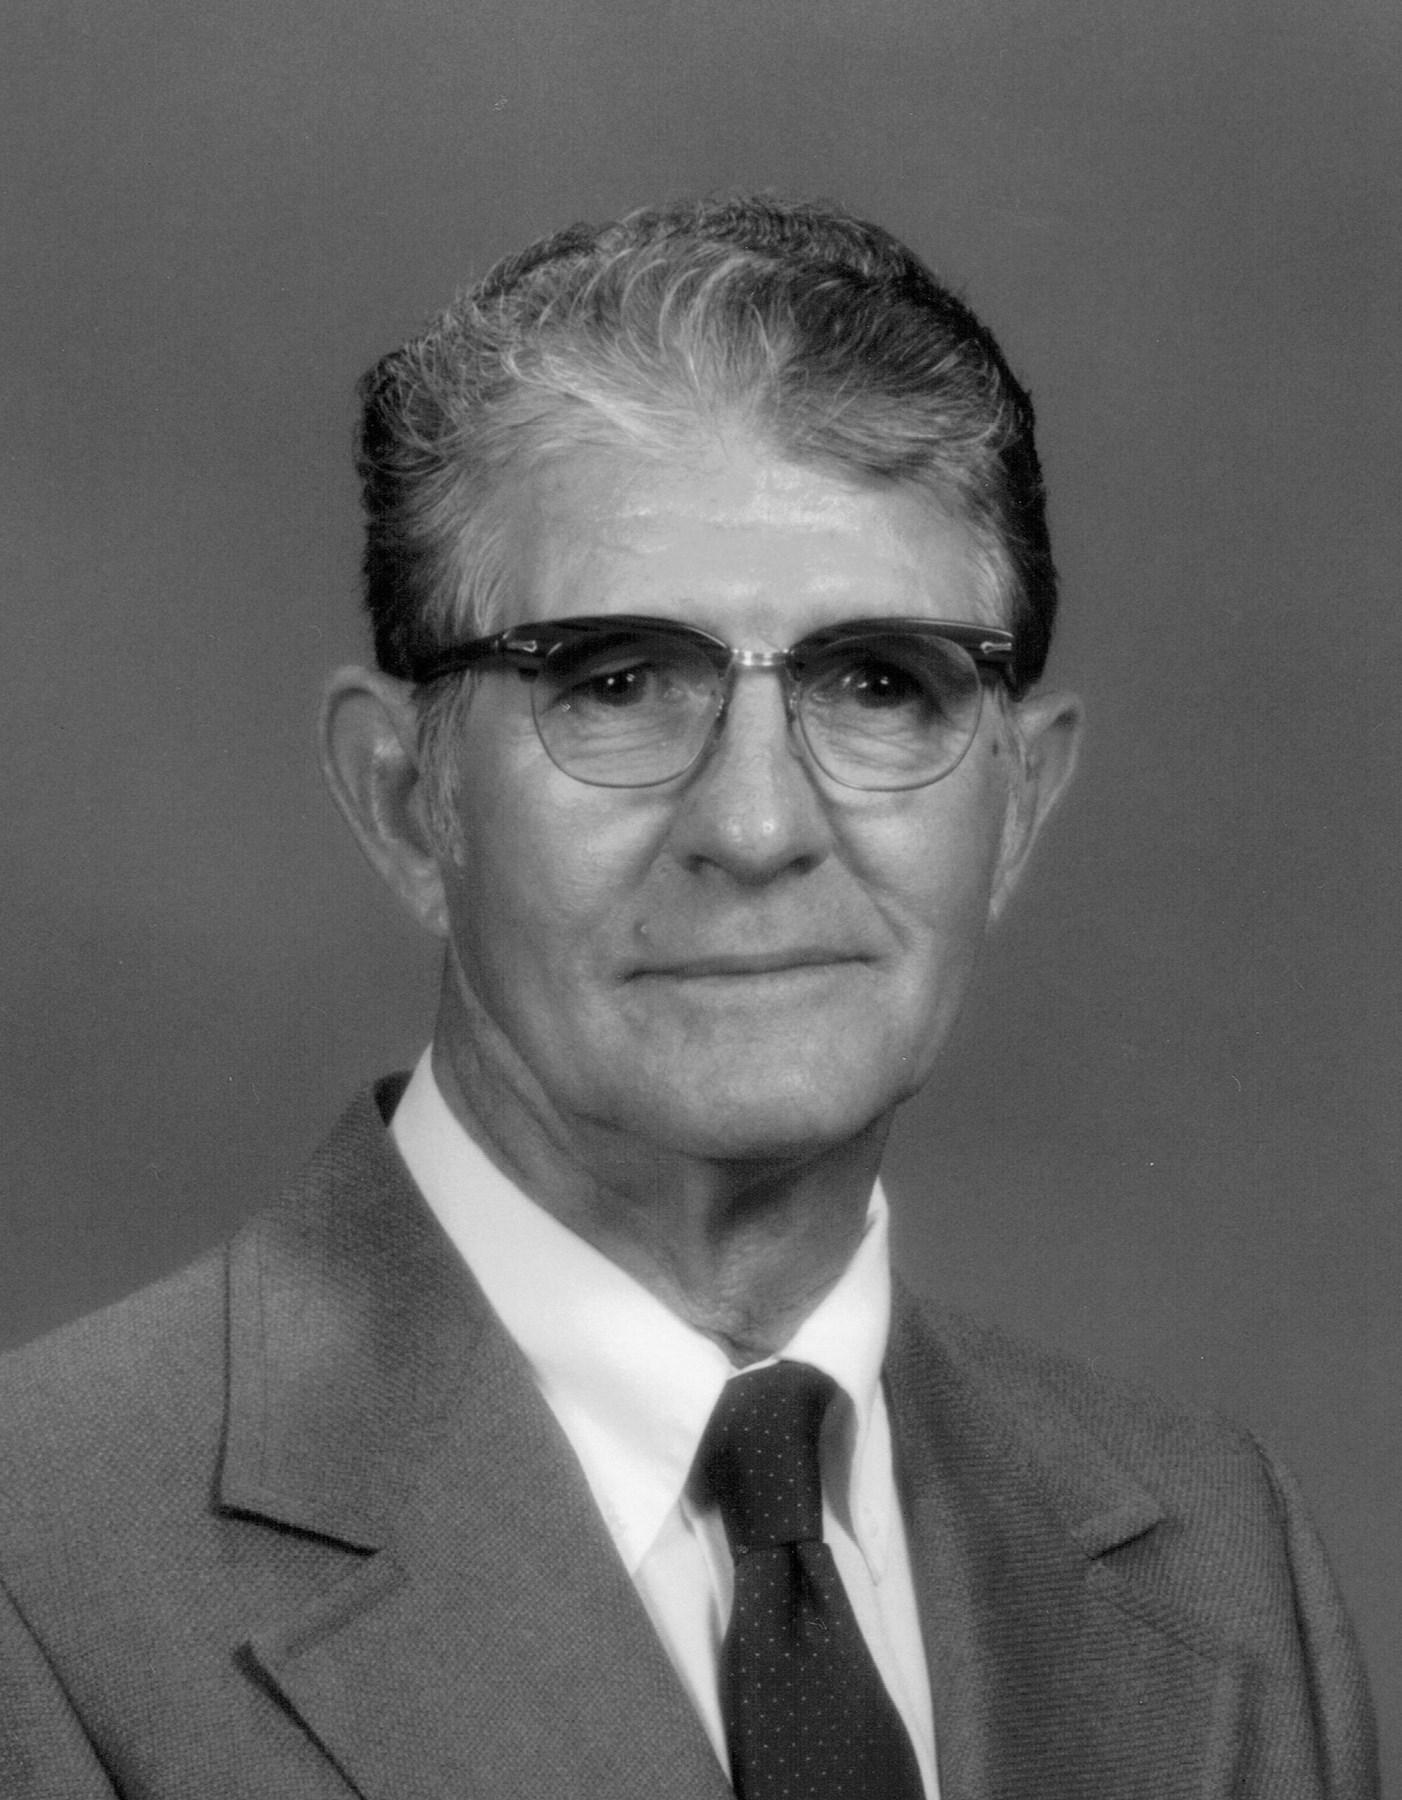 Allen wesley aw cockrell jr obituary lufkin tx izmirmasajfo